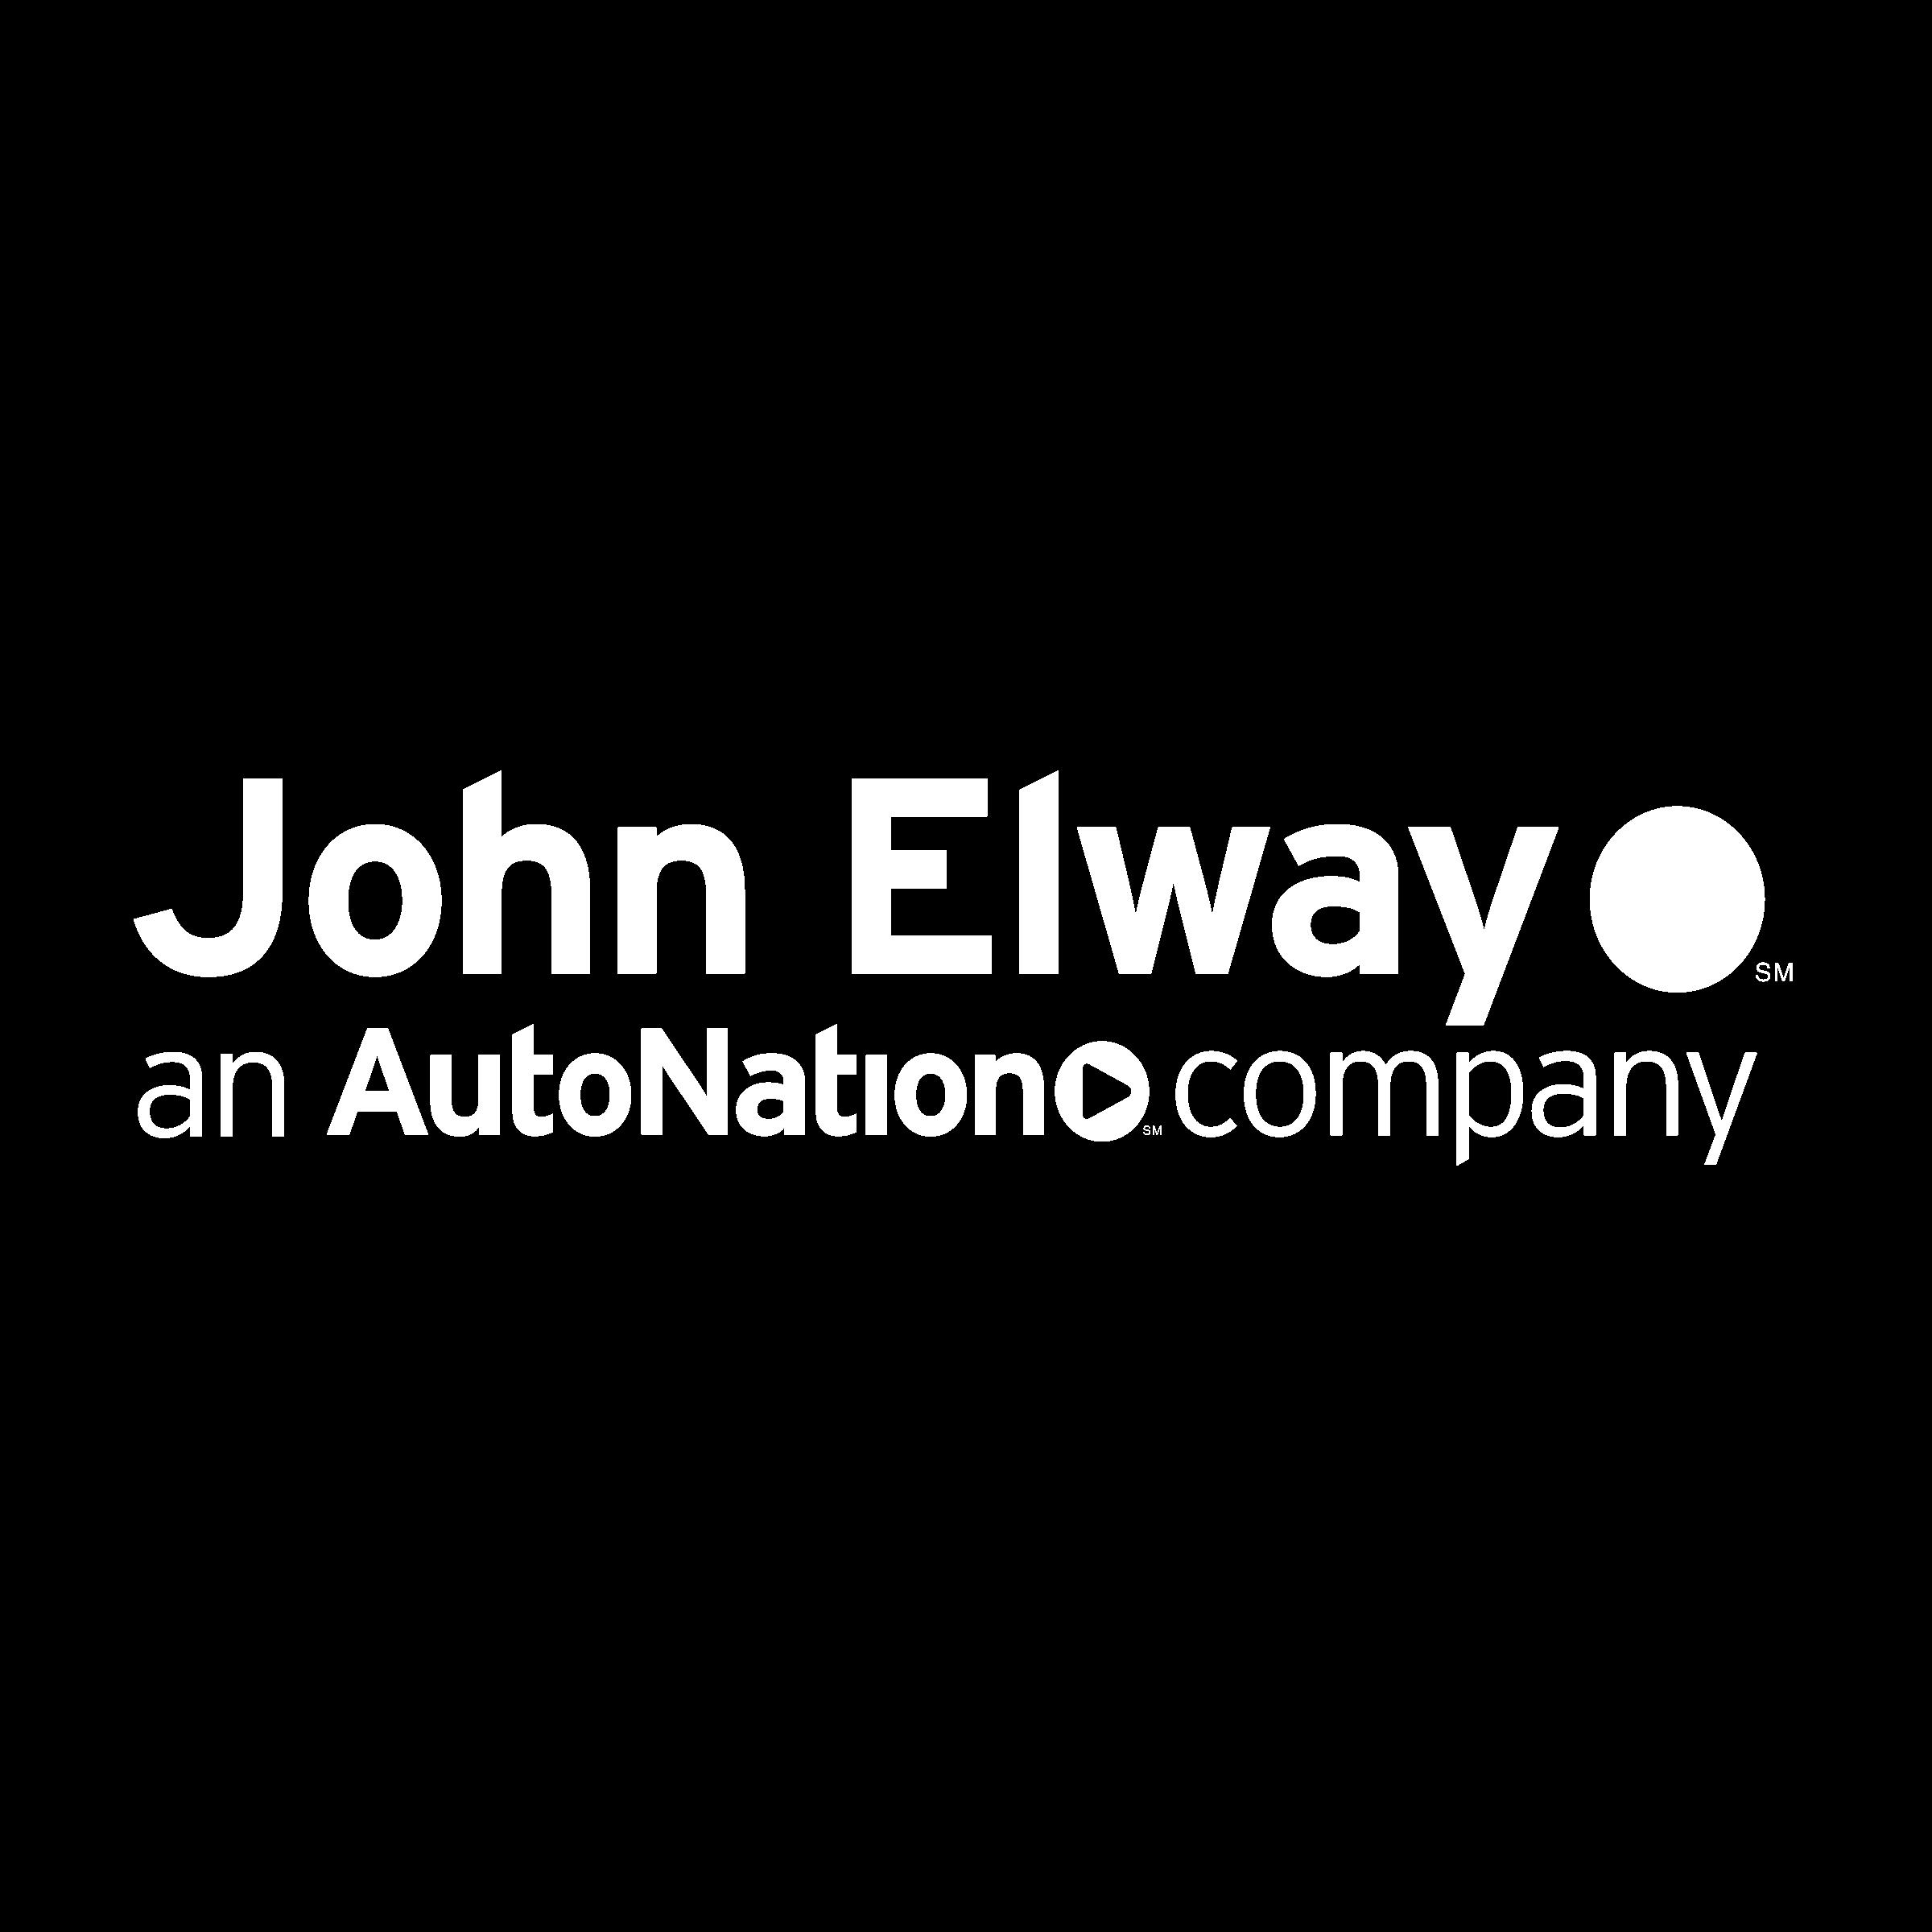 John Elway Logo Png Transparent Svg Vector Freebie Supply